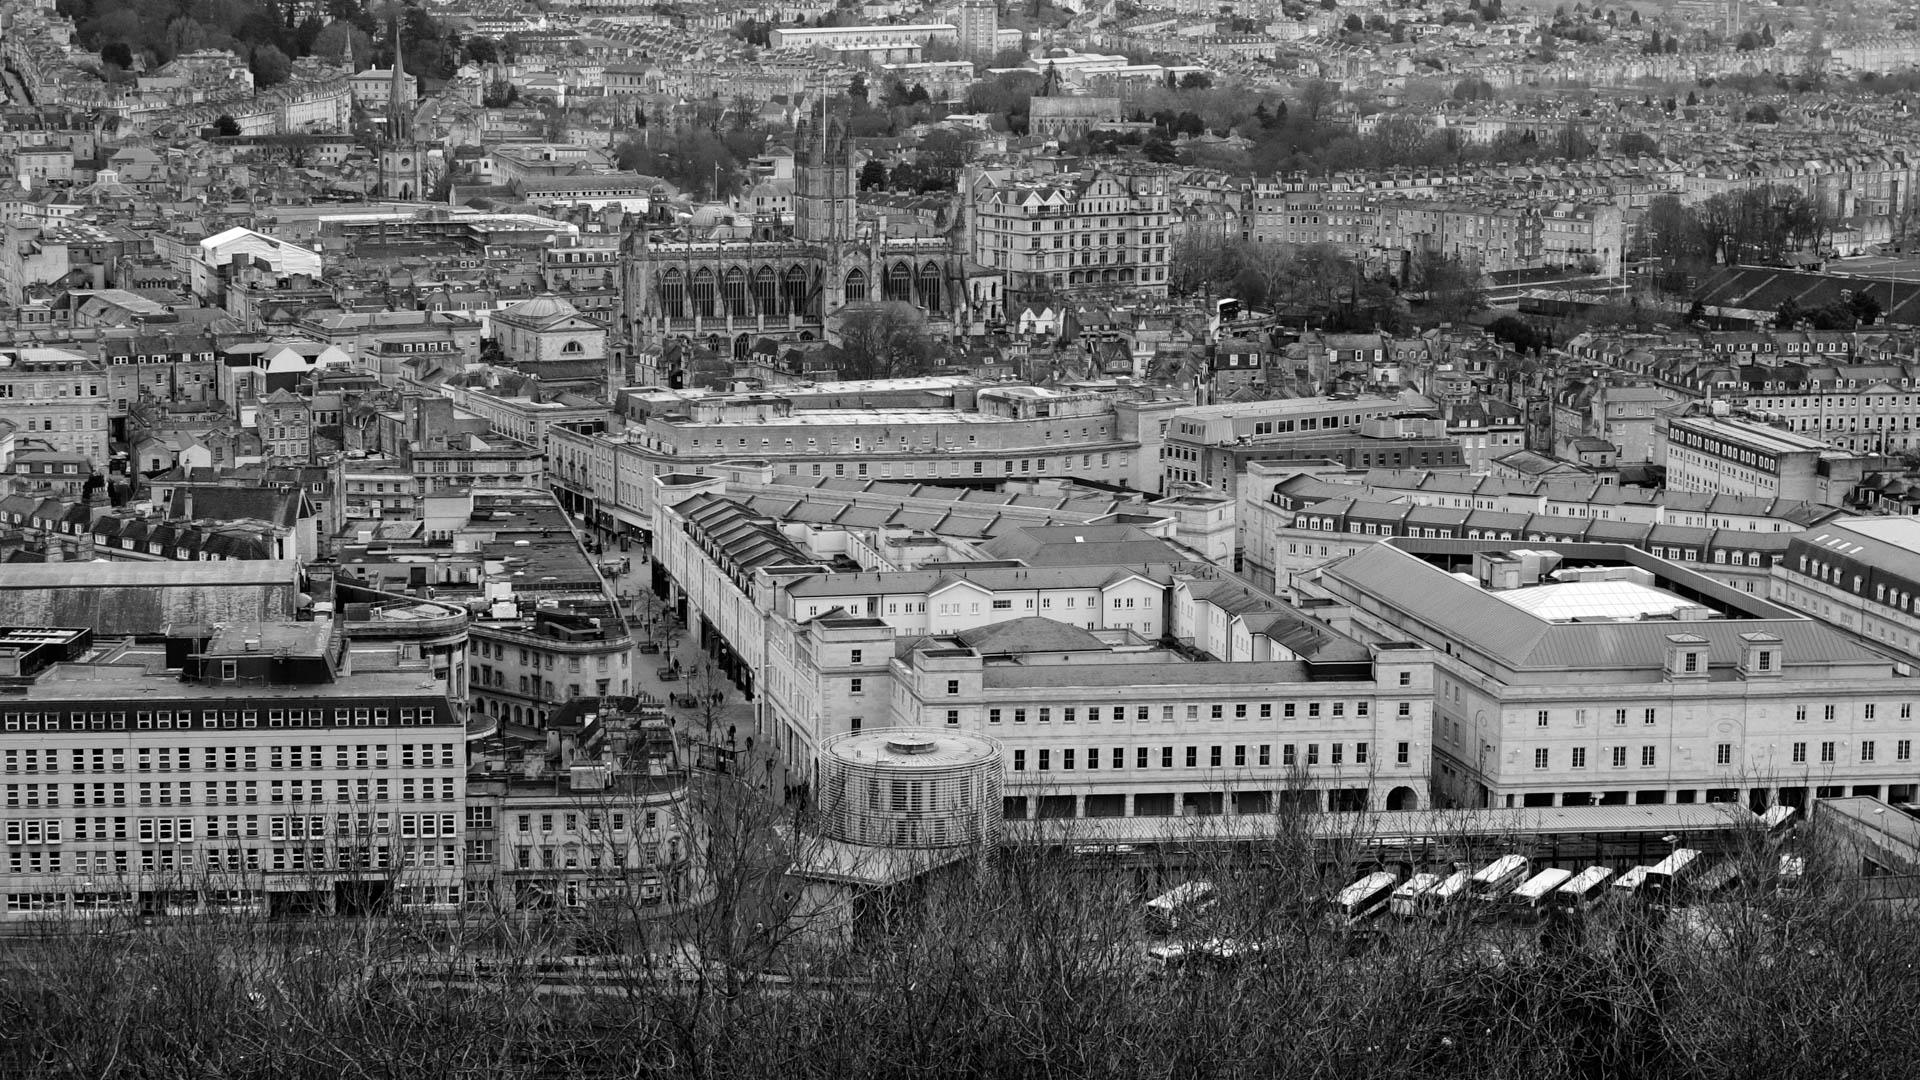 The City of Bath